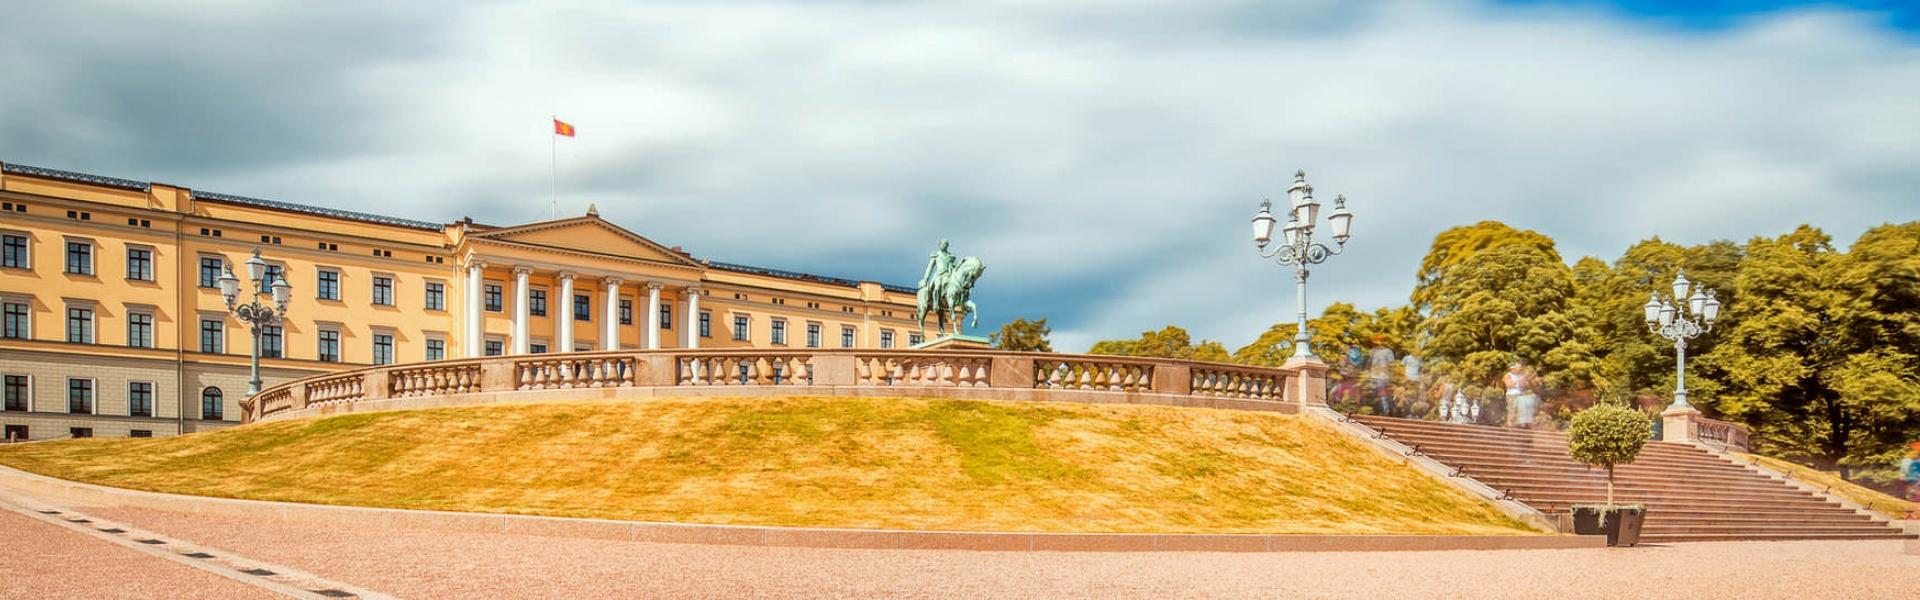 The fabulous capital of Norway, Oslo, is home to numerous Scandinavian landmarks